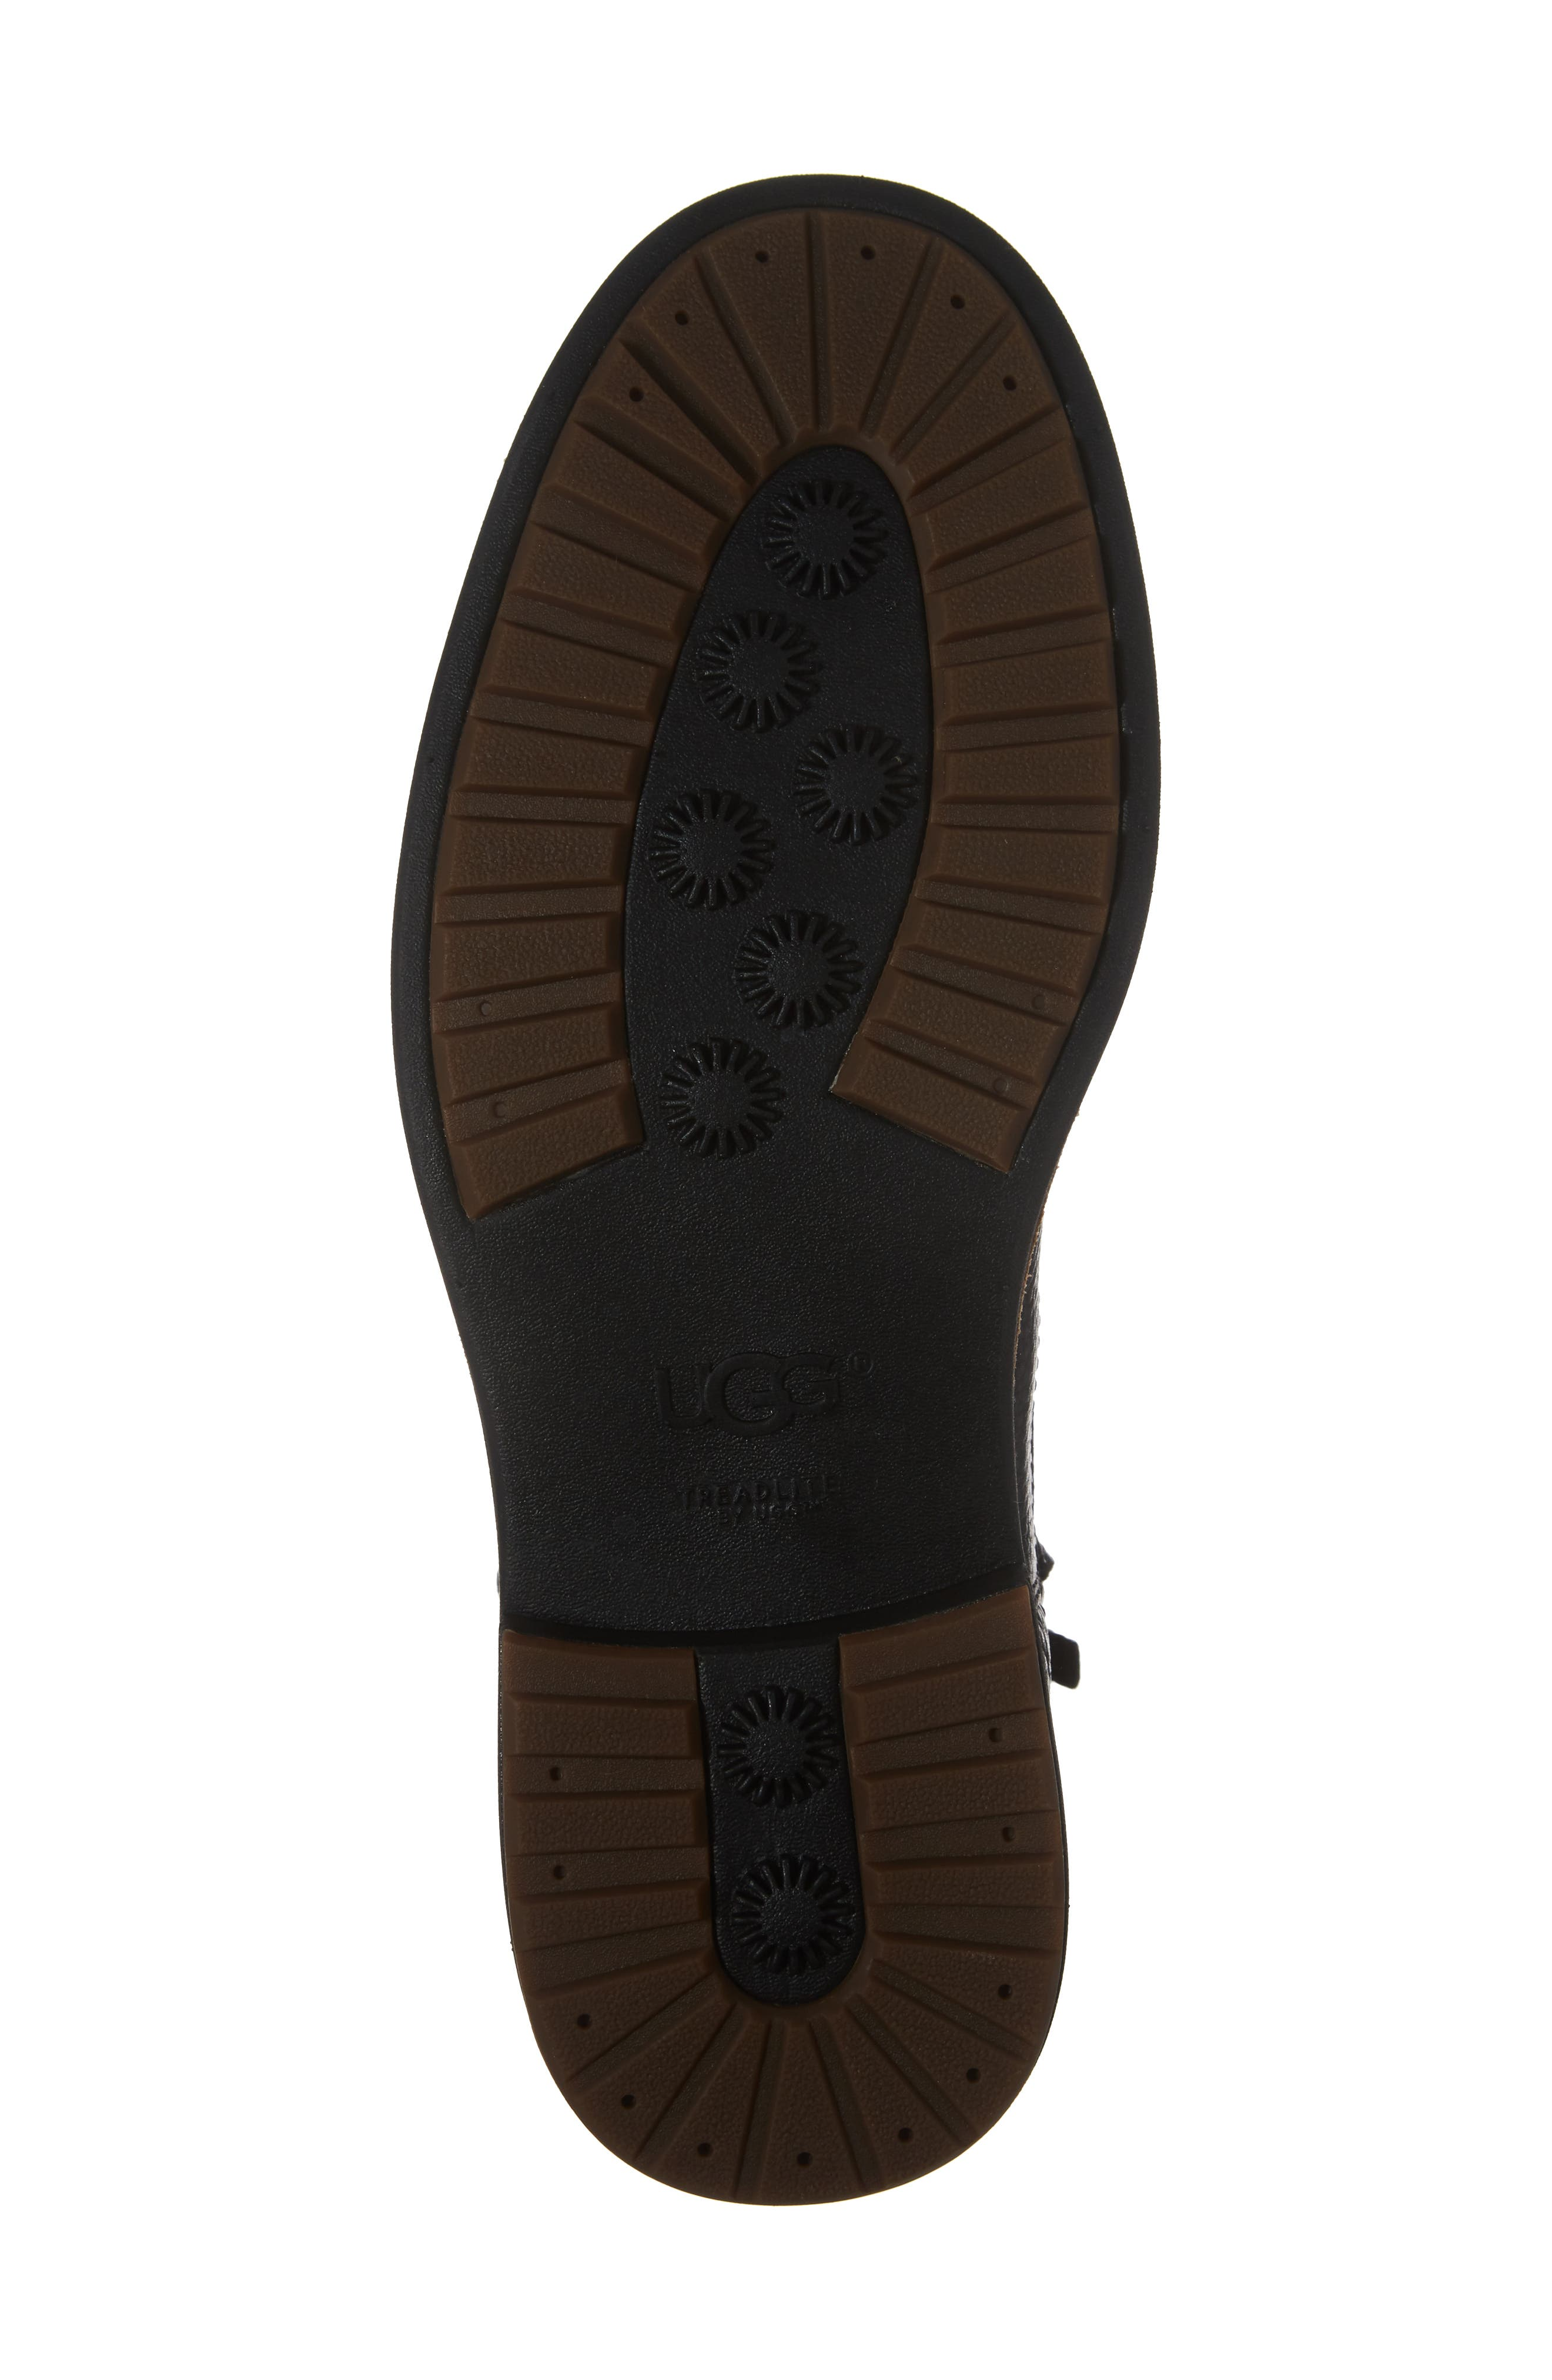 Jaren Zip Boot with Genuine Shearling,                             Alternate thumbnail 6, color,                             Black